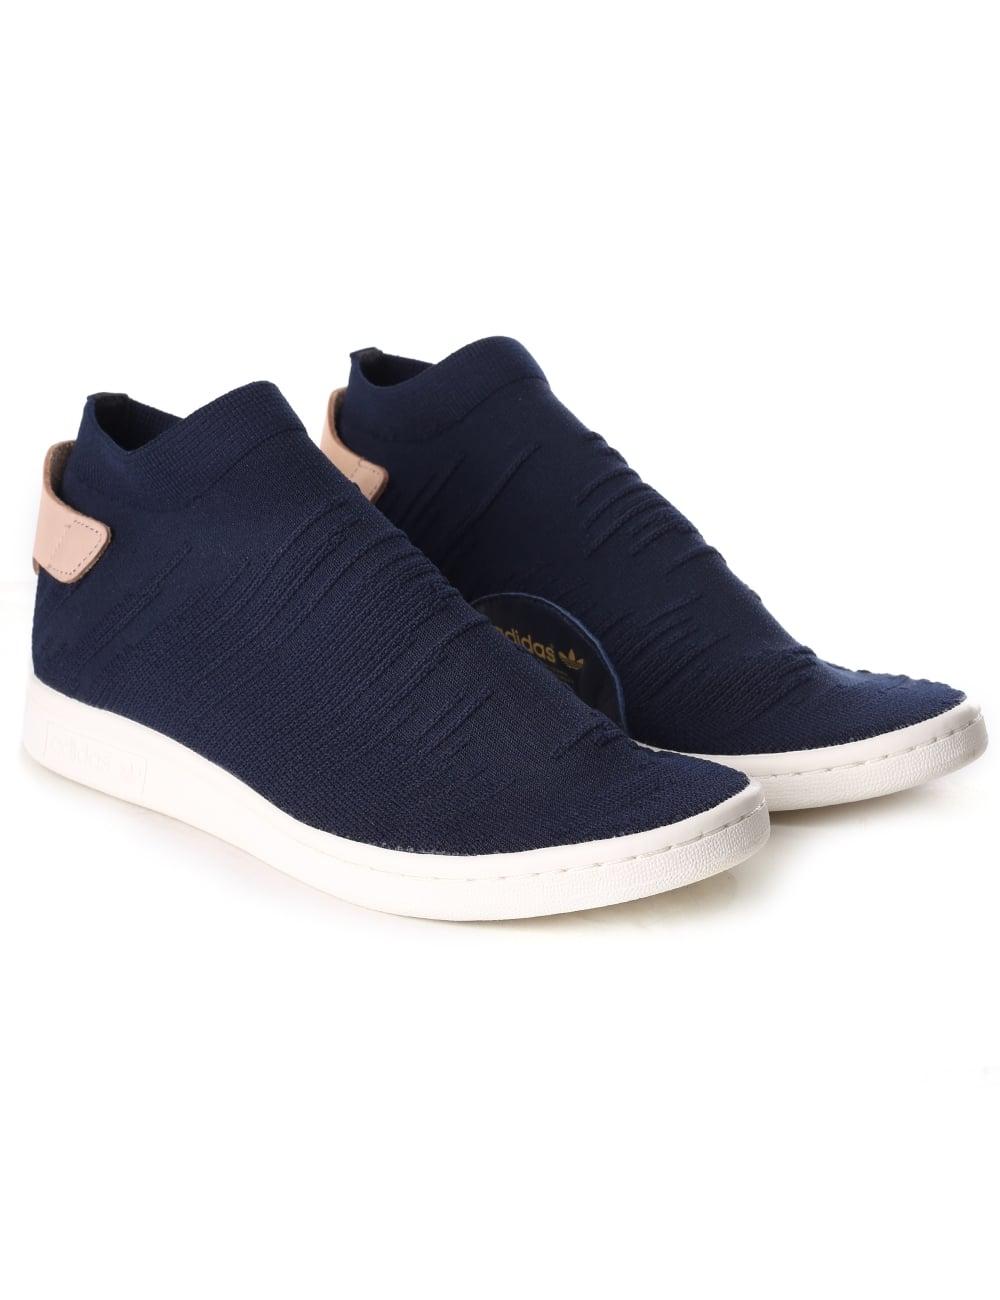 chaussure stan smith sock primeknit Off 58% platrerie